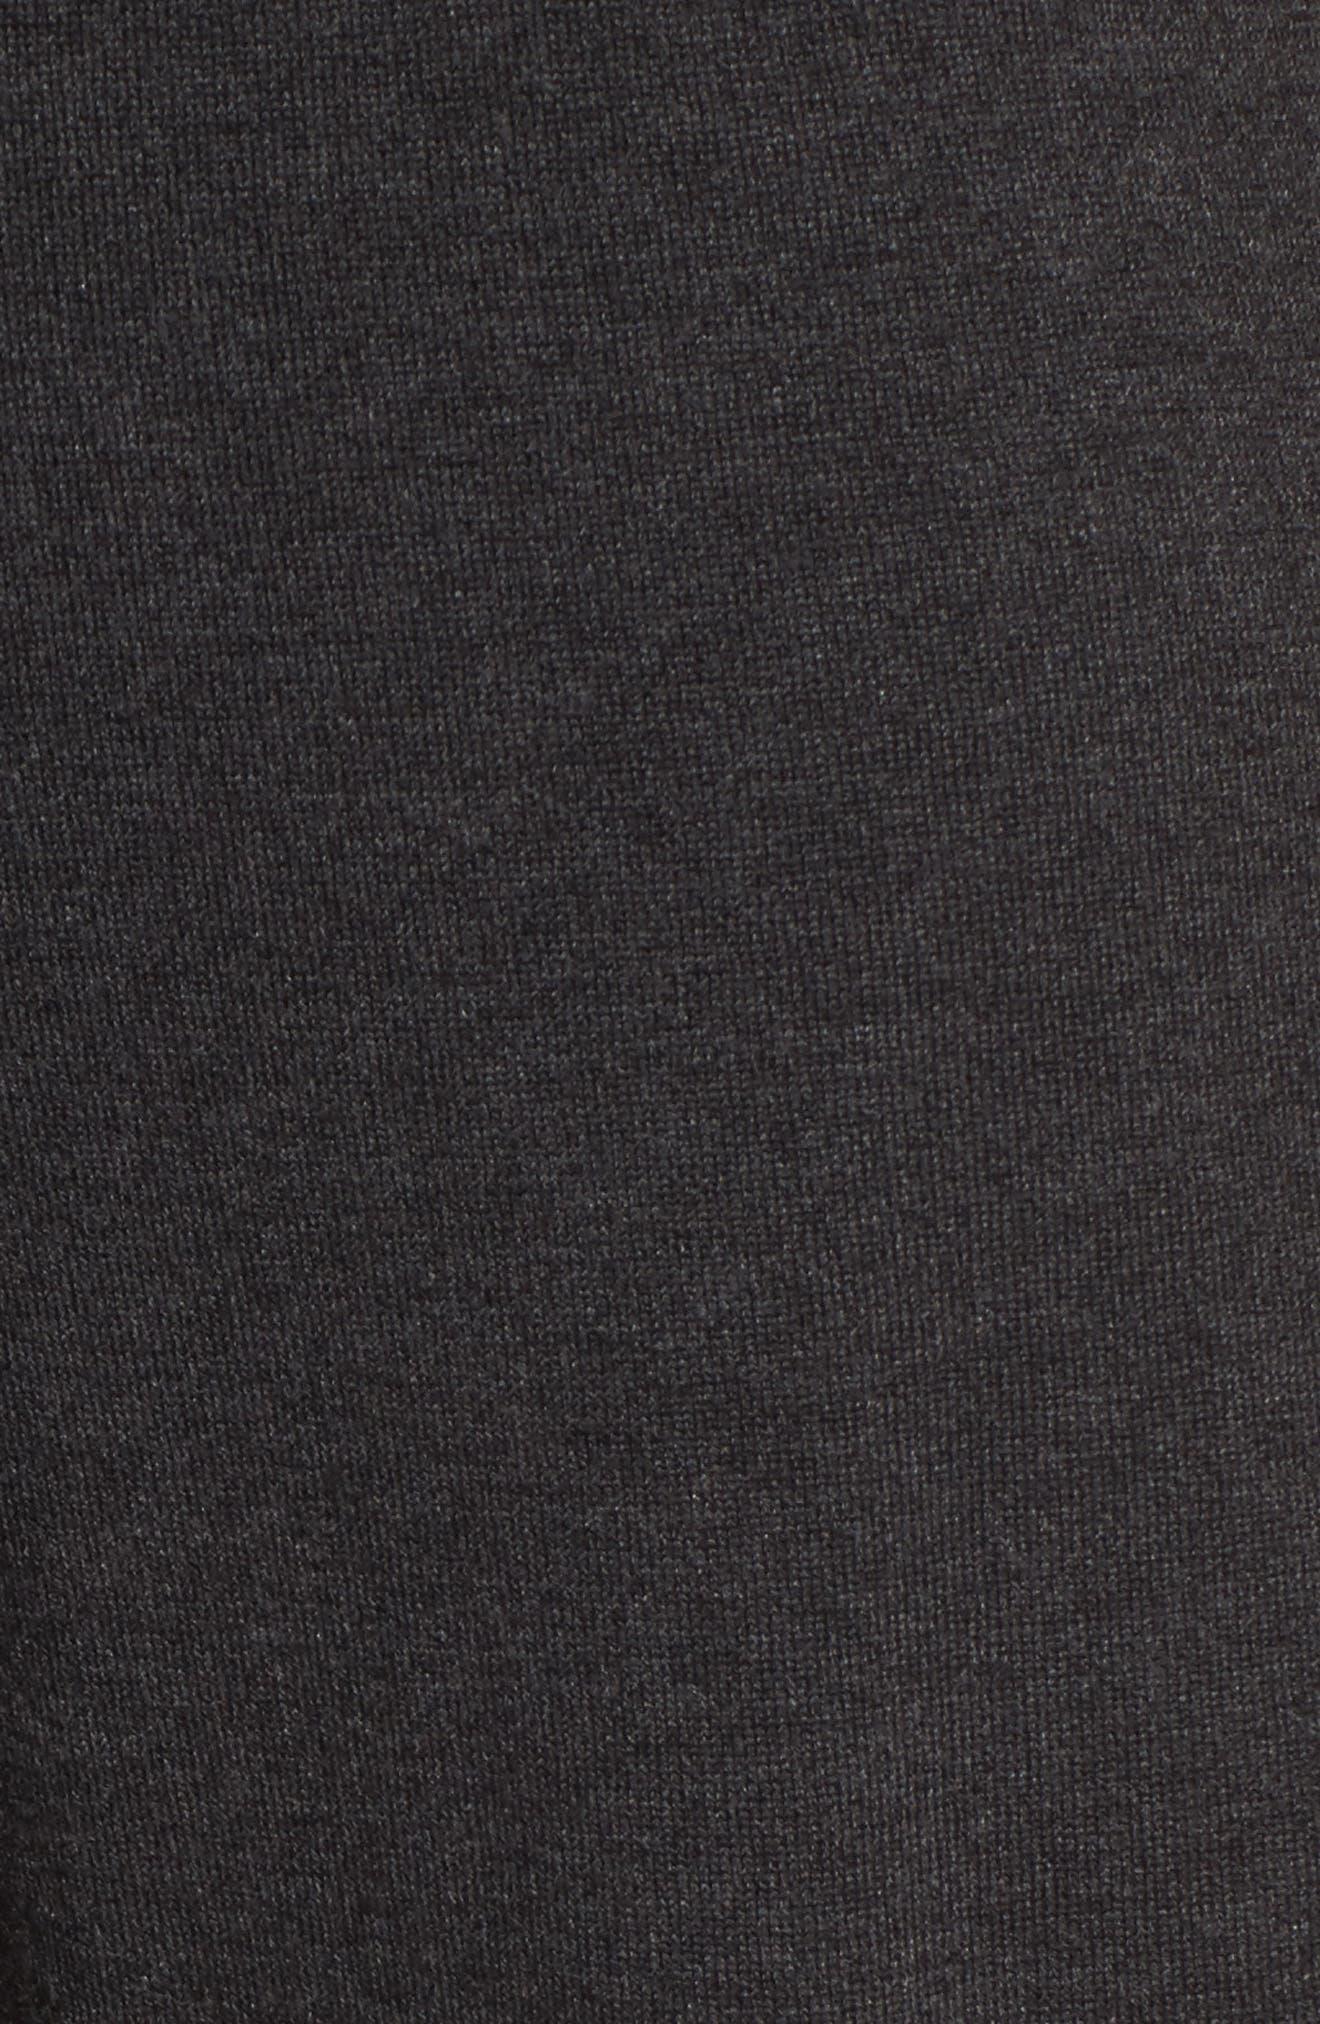 Tencel<sup>®</sup> Lyocell Blend Knit Wide Leg Pants,                             Alternate thumbnail 5, color,